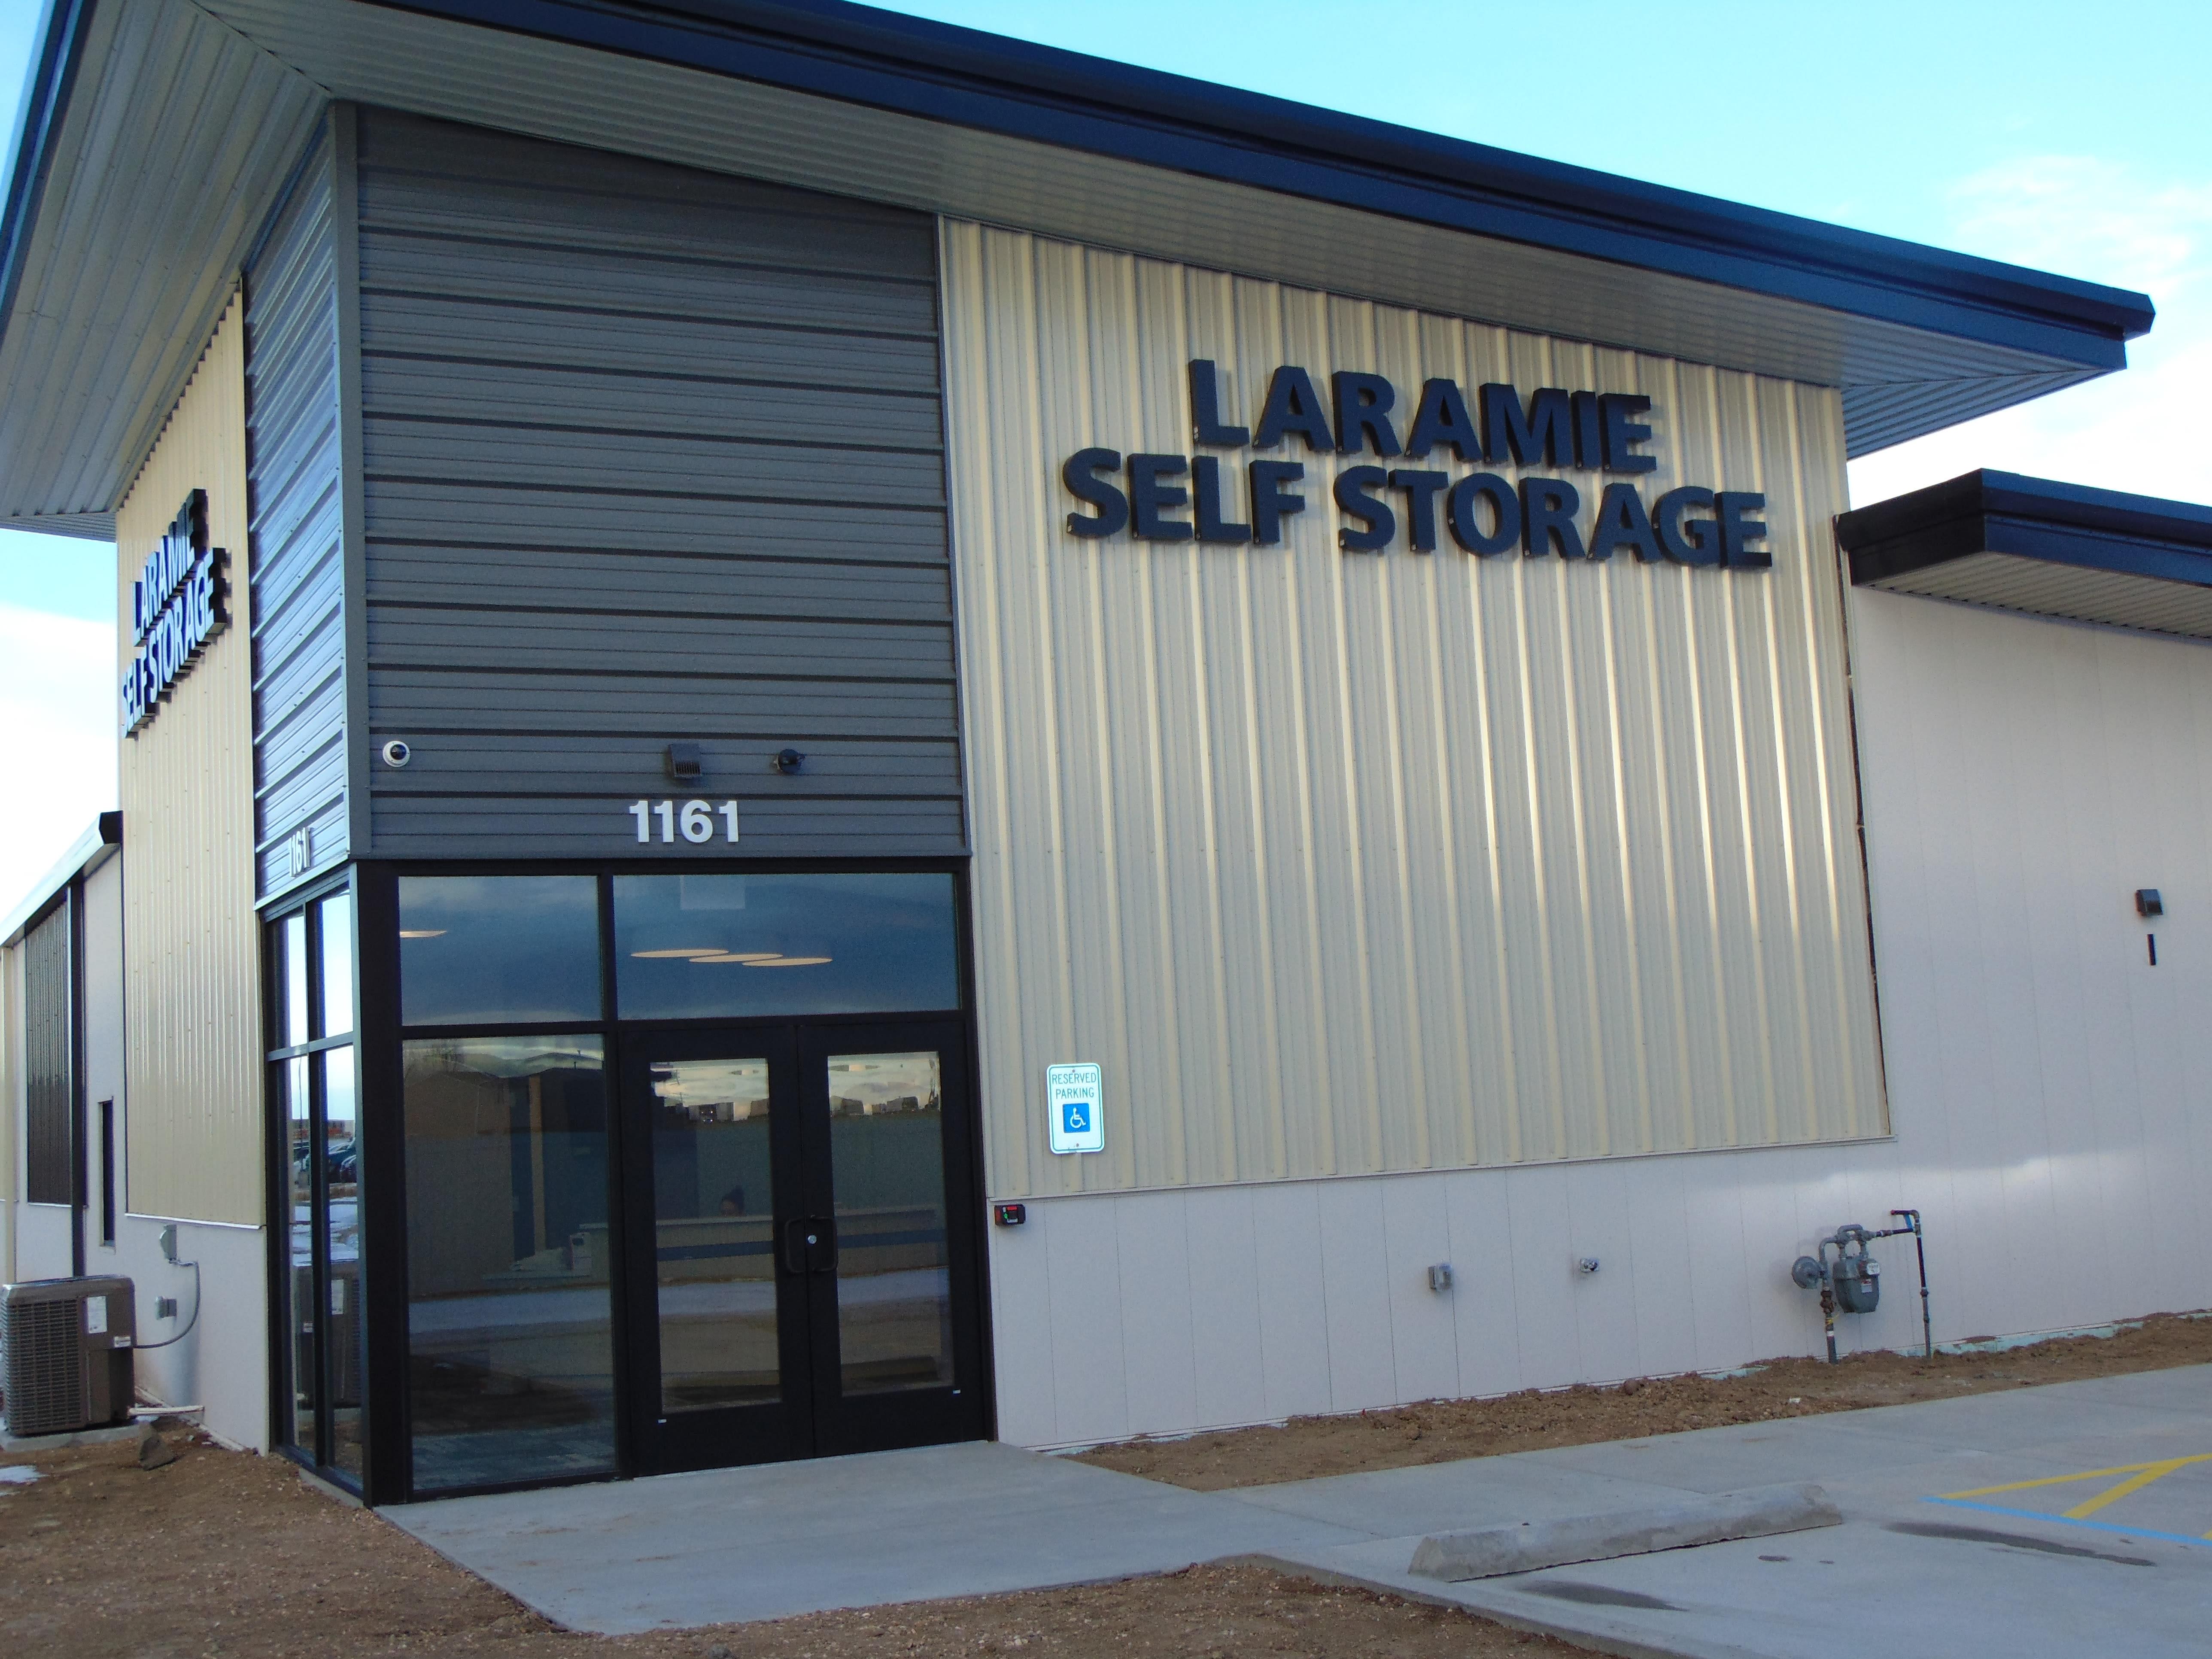 Laramie Self Storage in Laramie, Wyoming